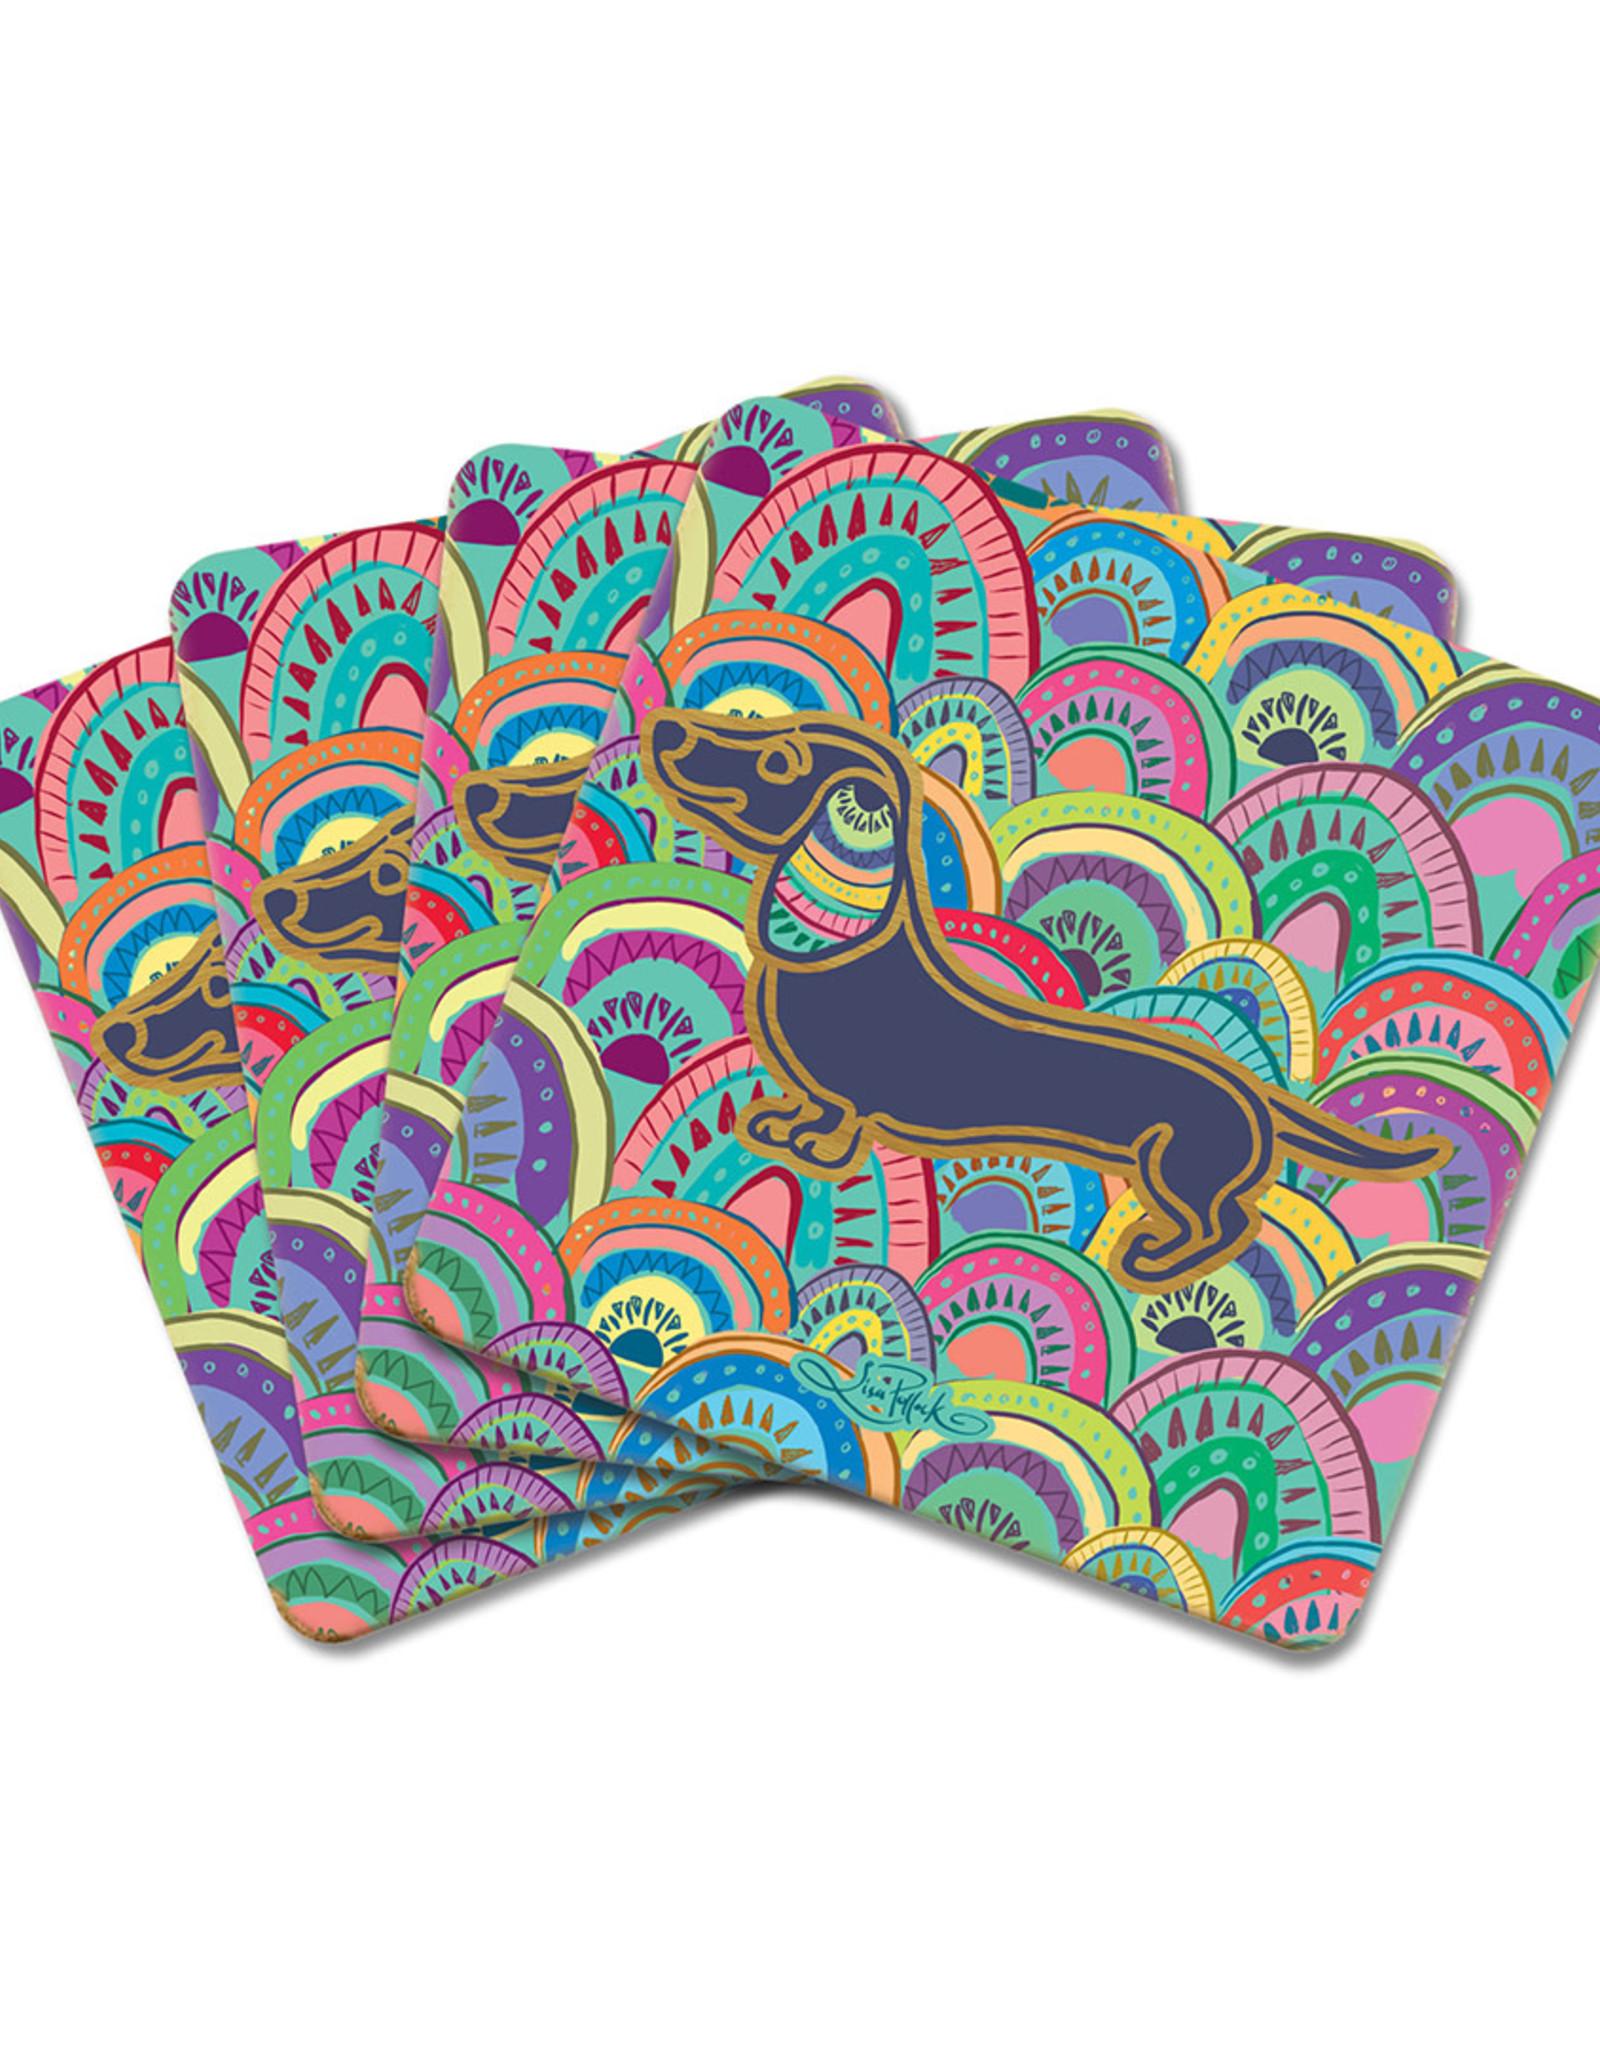 LISA POLLOCK Set/4 Bamboo Coaster - 4 Available Designs